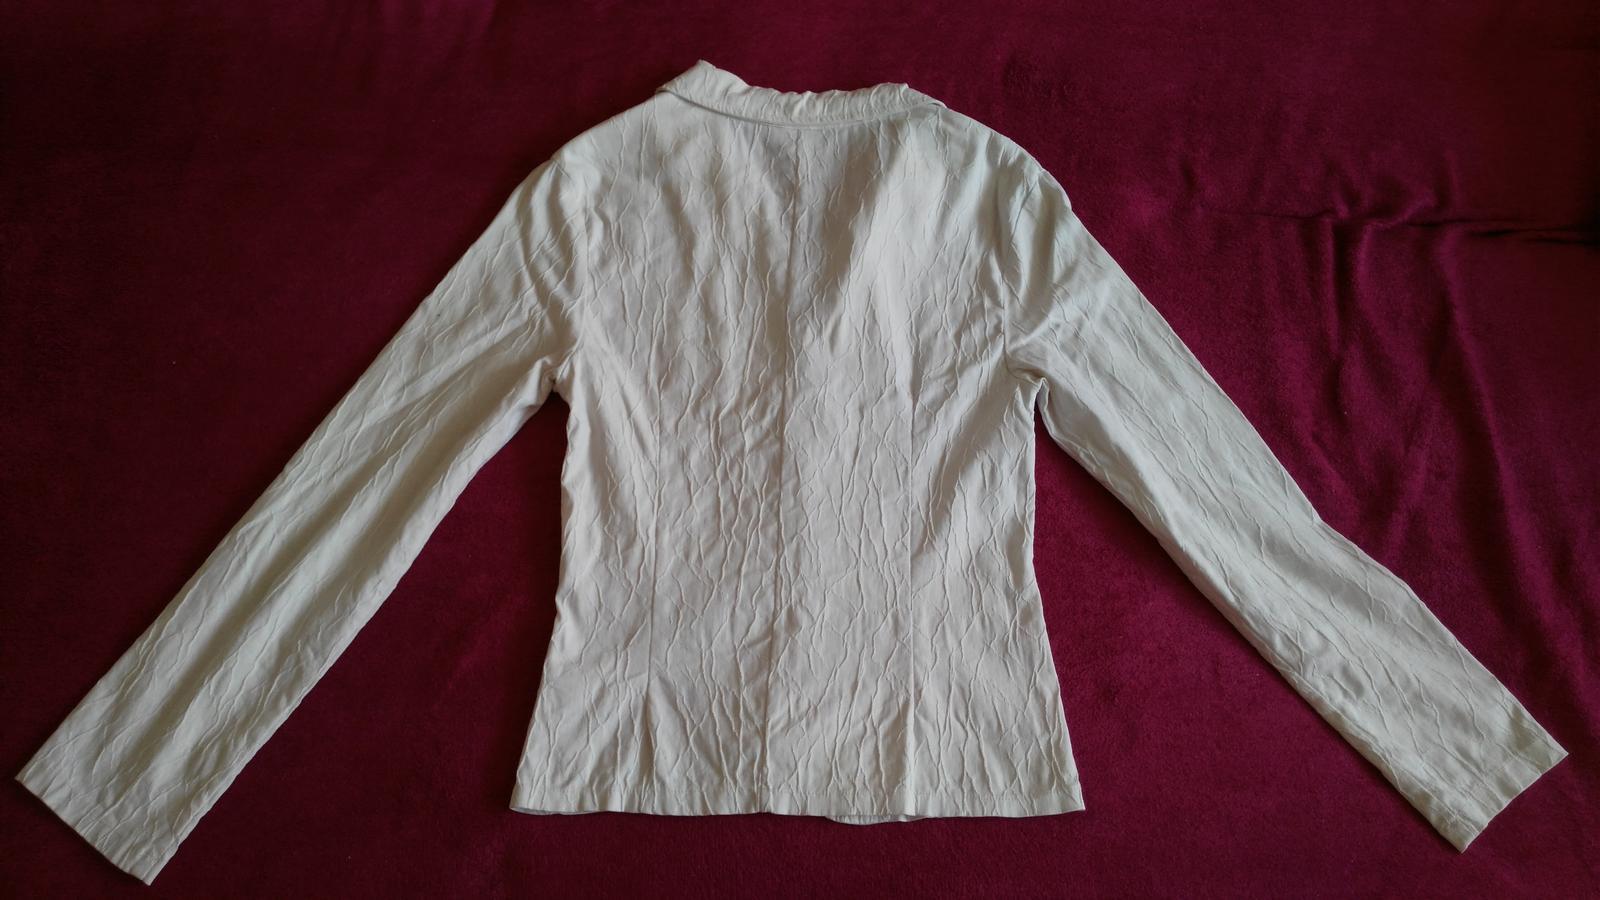 Biele elastické sako 38-40/M-L - Obrázok č. 3